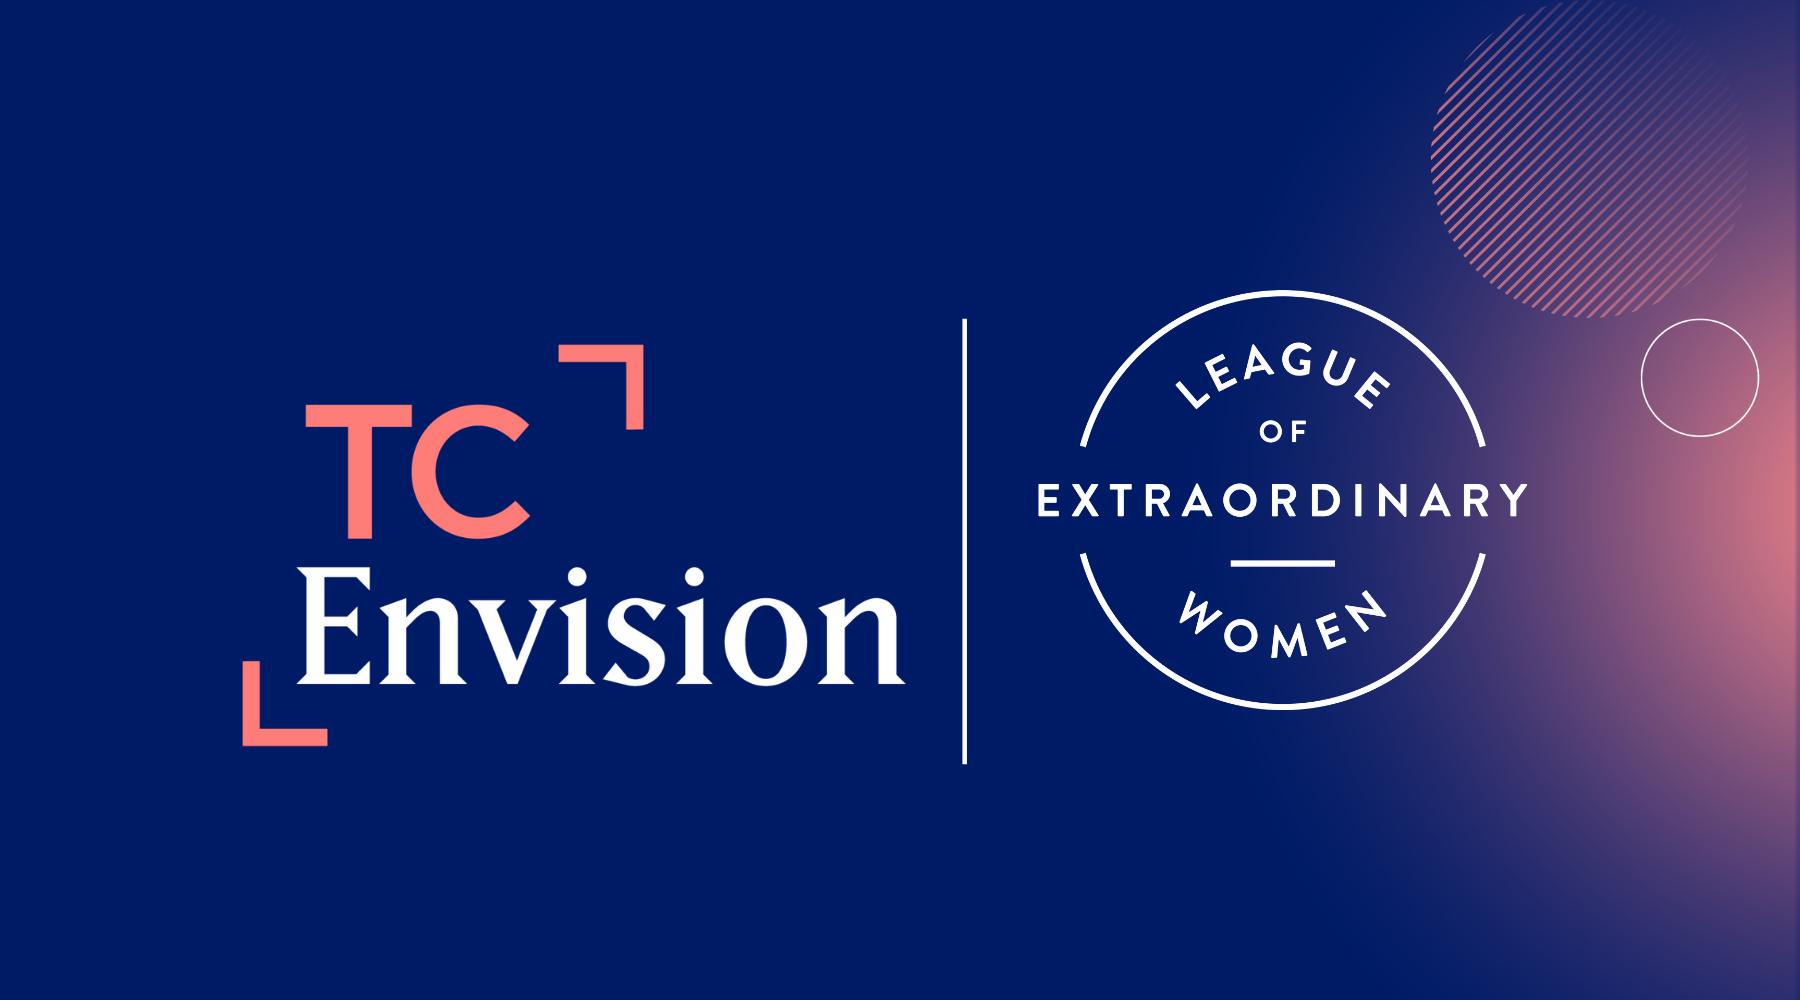 Envision extraordinary women